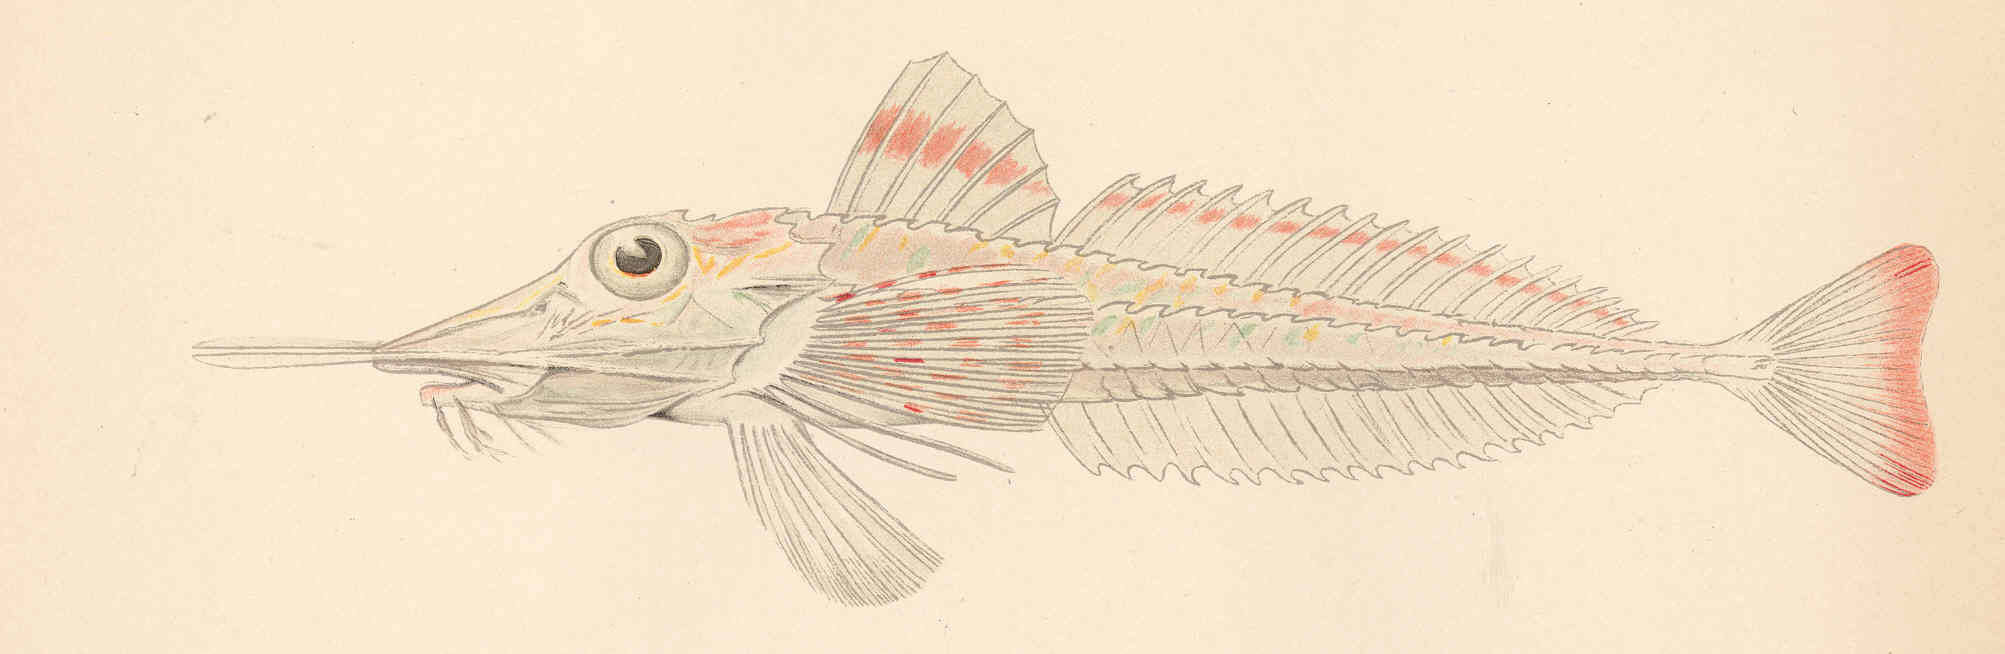 Image of slender searobin